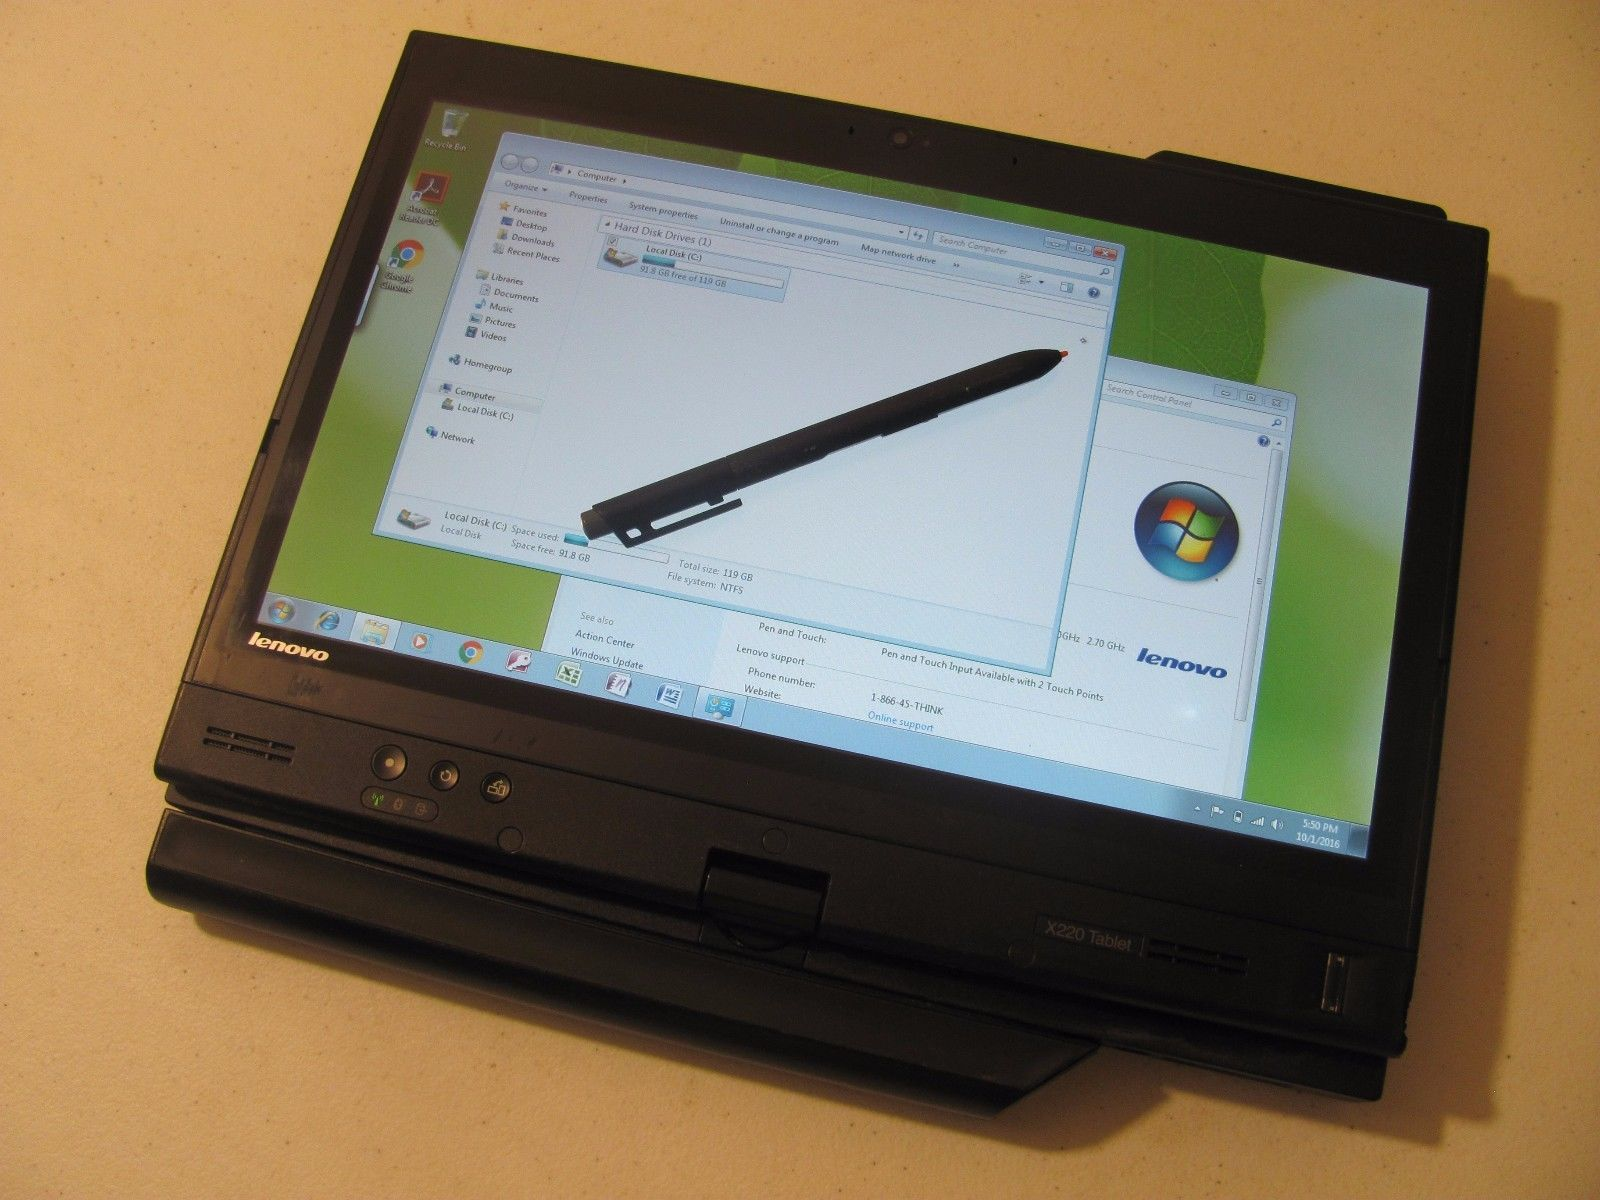 Lenovo ThinkPad X220 Tablet Core i7 2 70GHz 8 GB 128 GB SSD Win 7